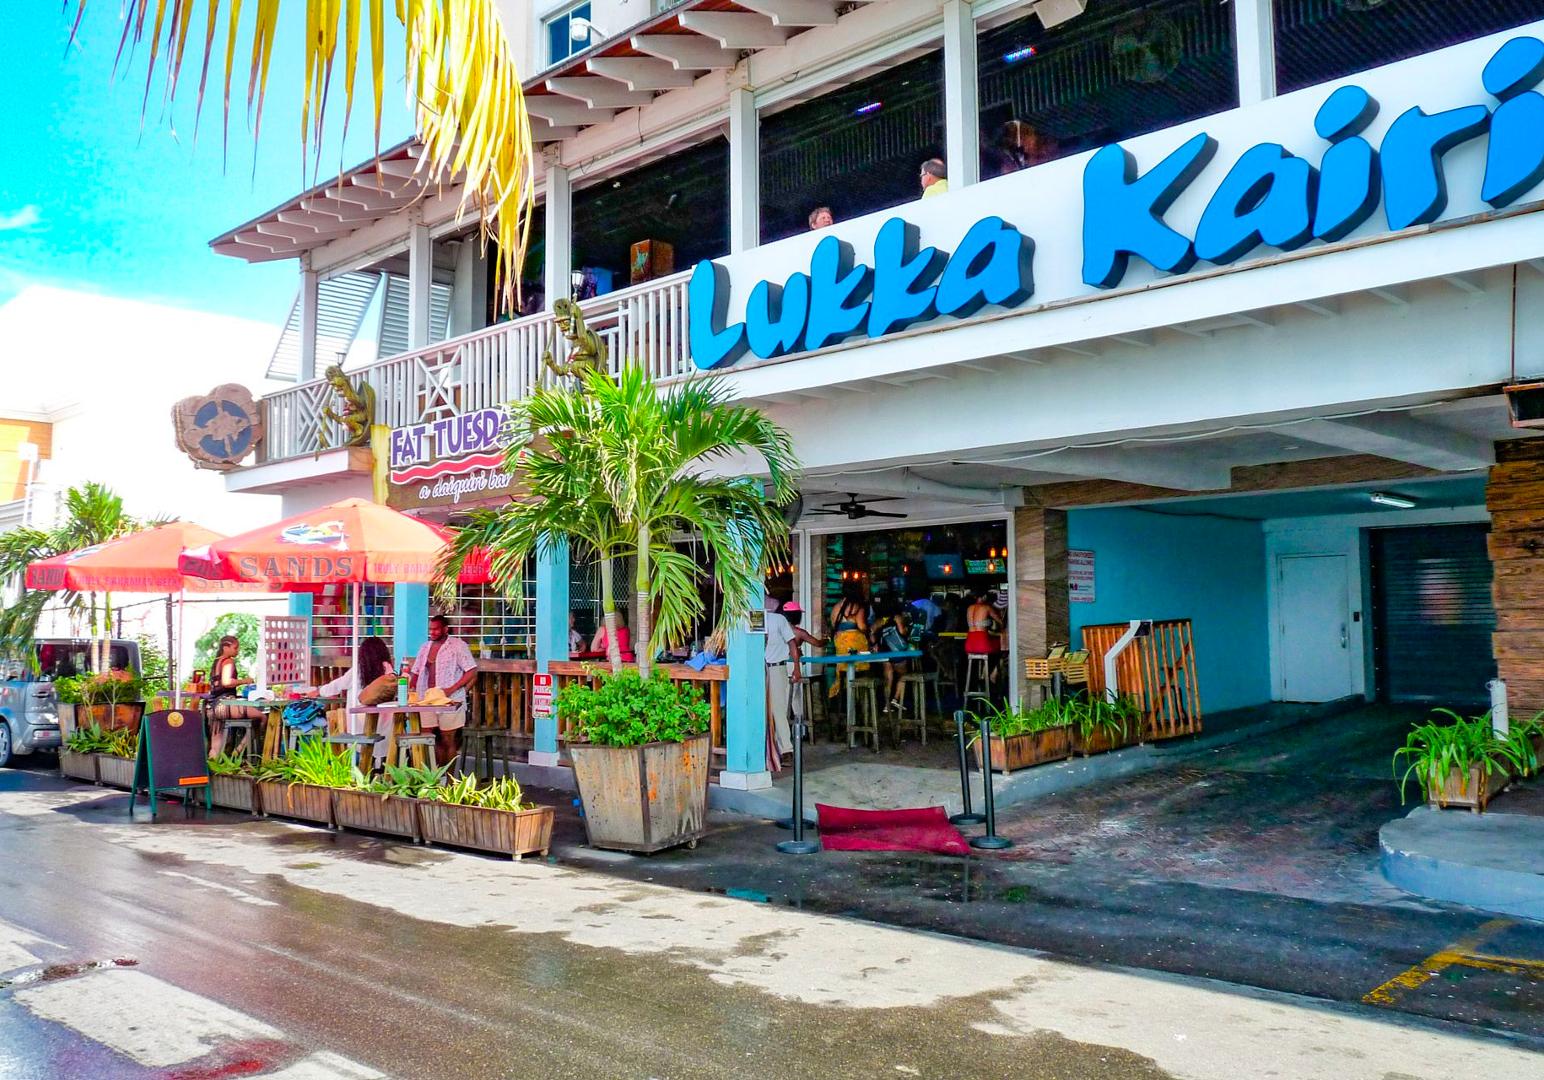 Lukka Kairi Resturant - Bahamas